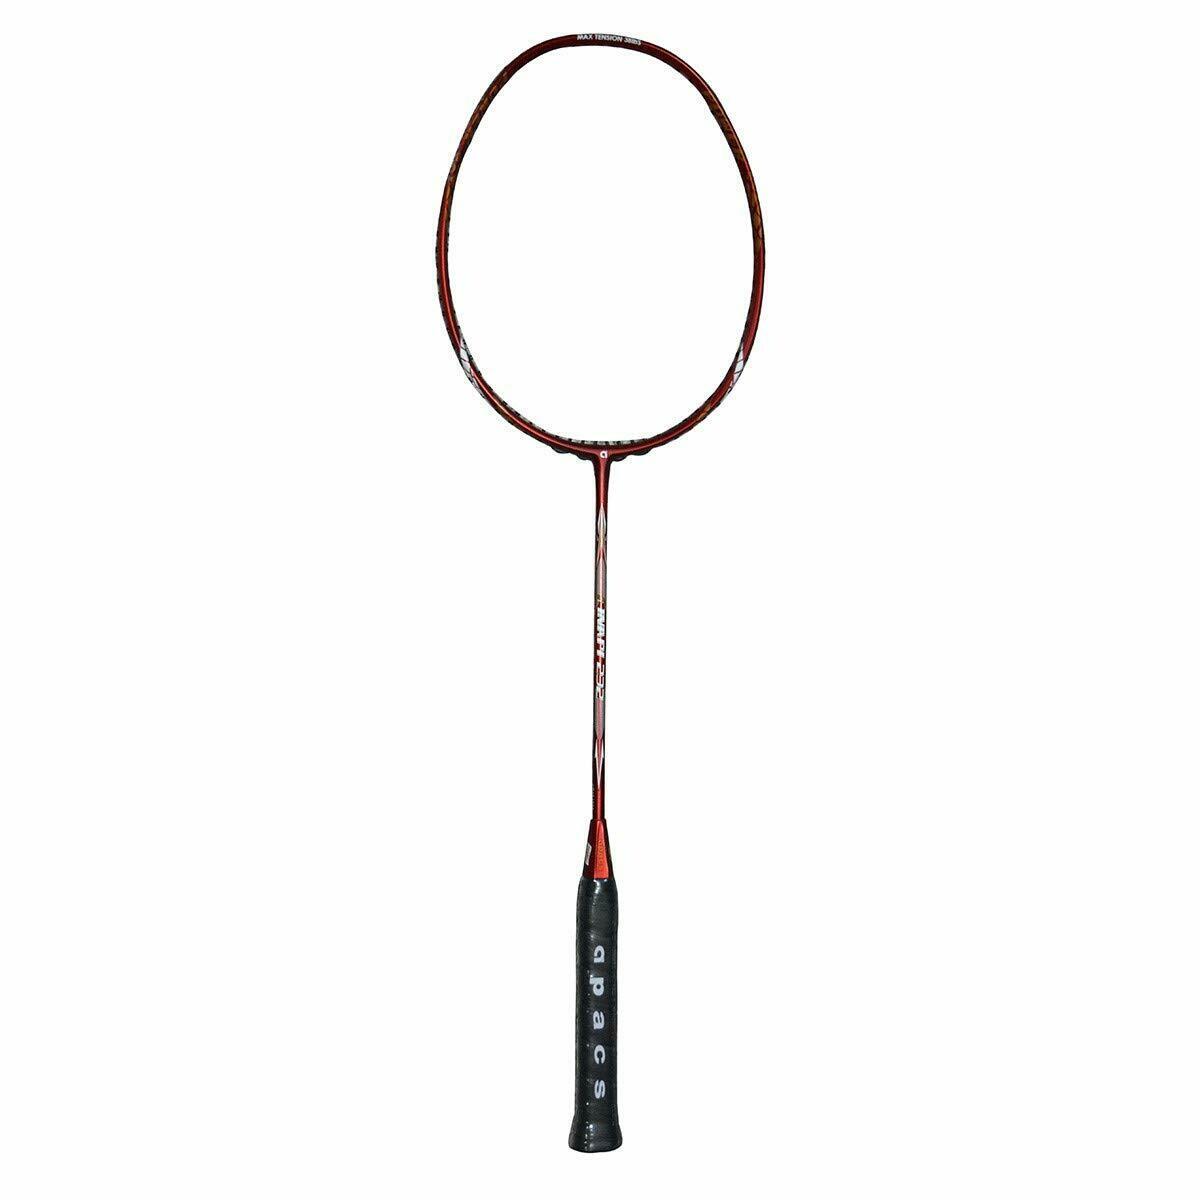 Apacs Finapi 232 Red Badminton Racket